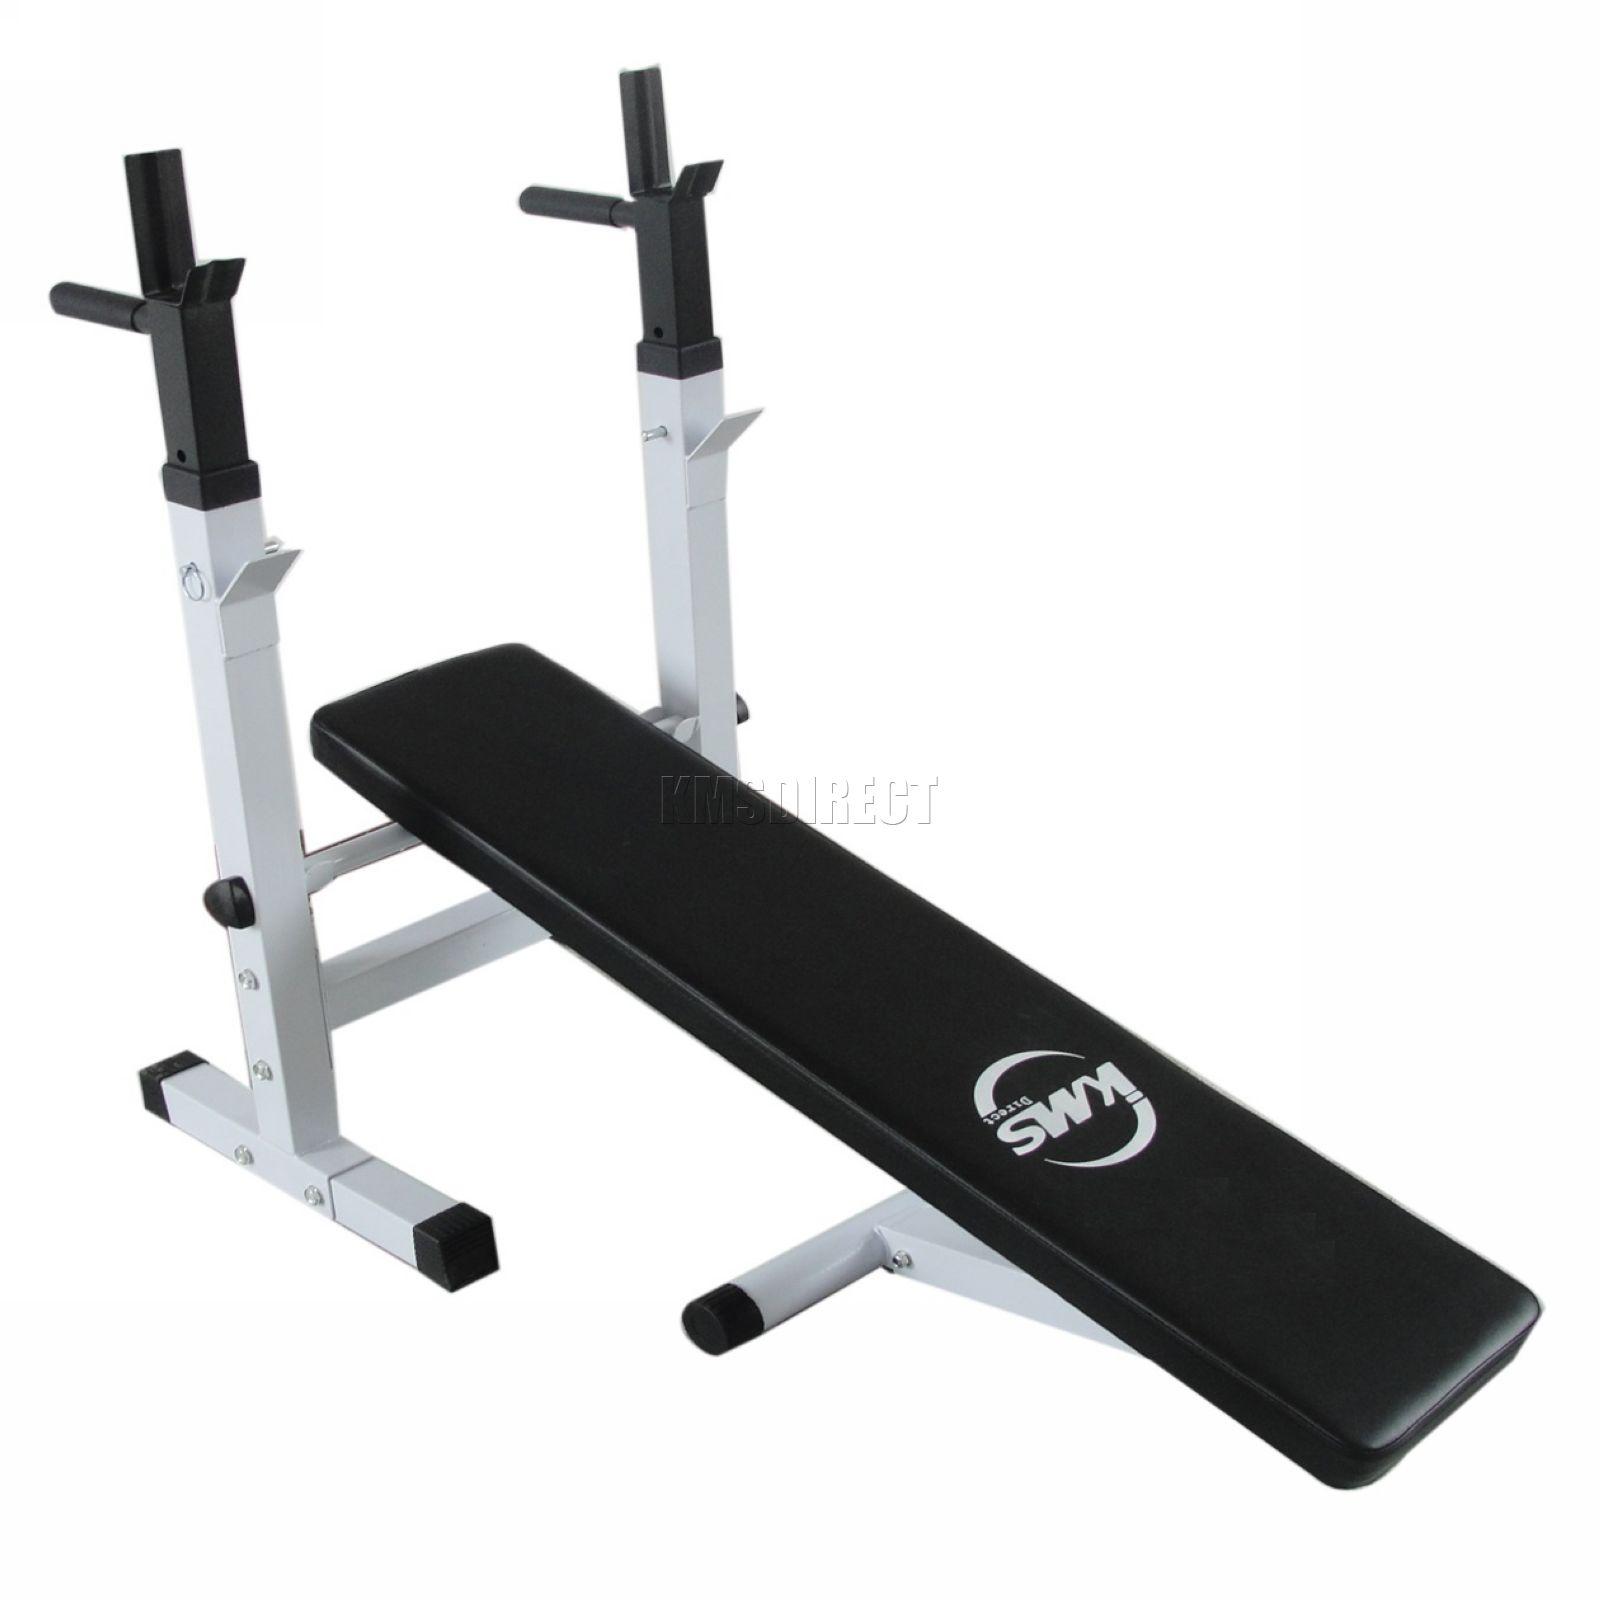 olympic fitness bar workout bench center decline nldowb weight lights depot northern